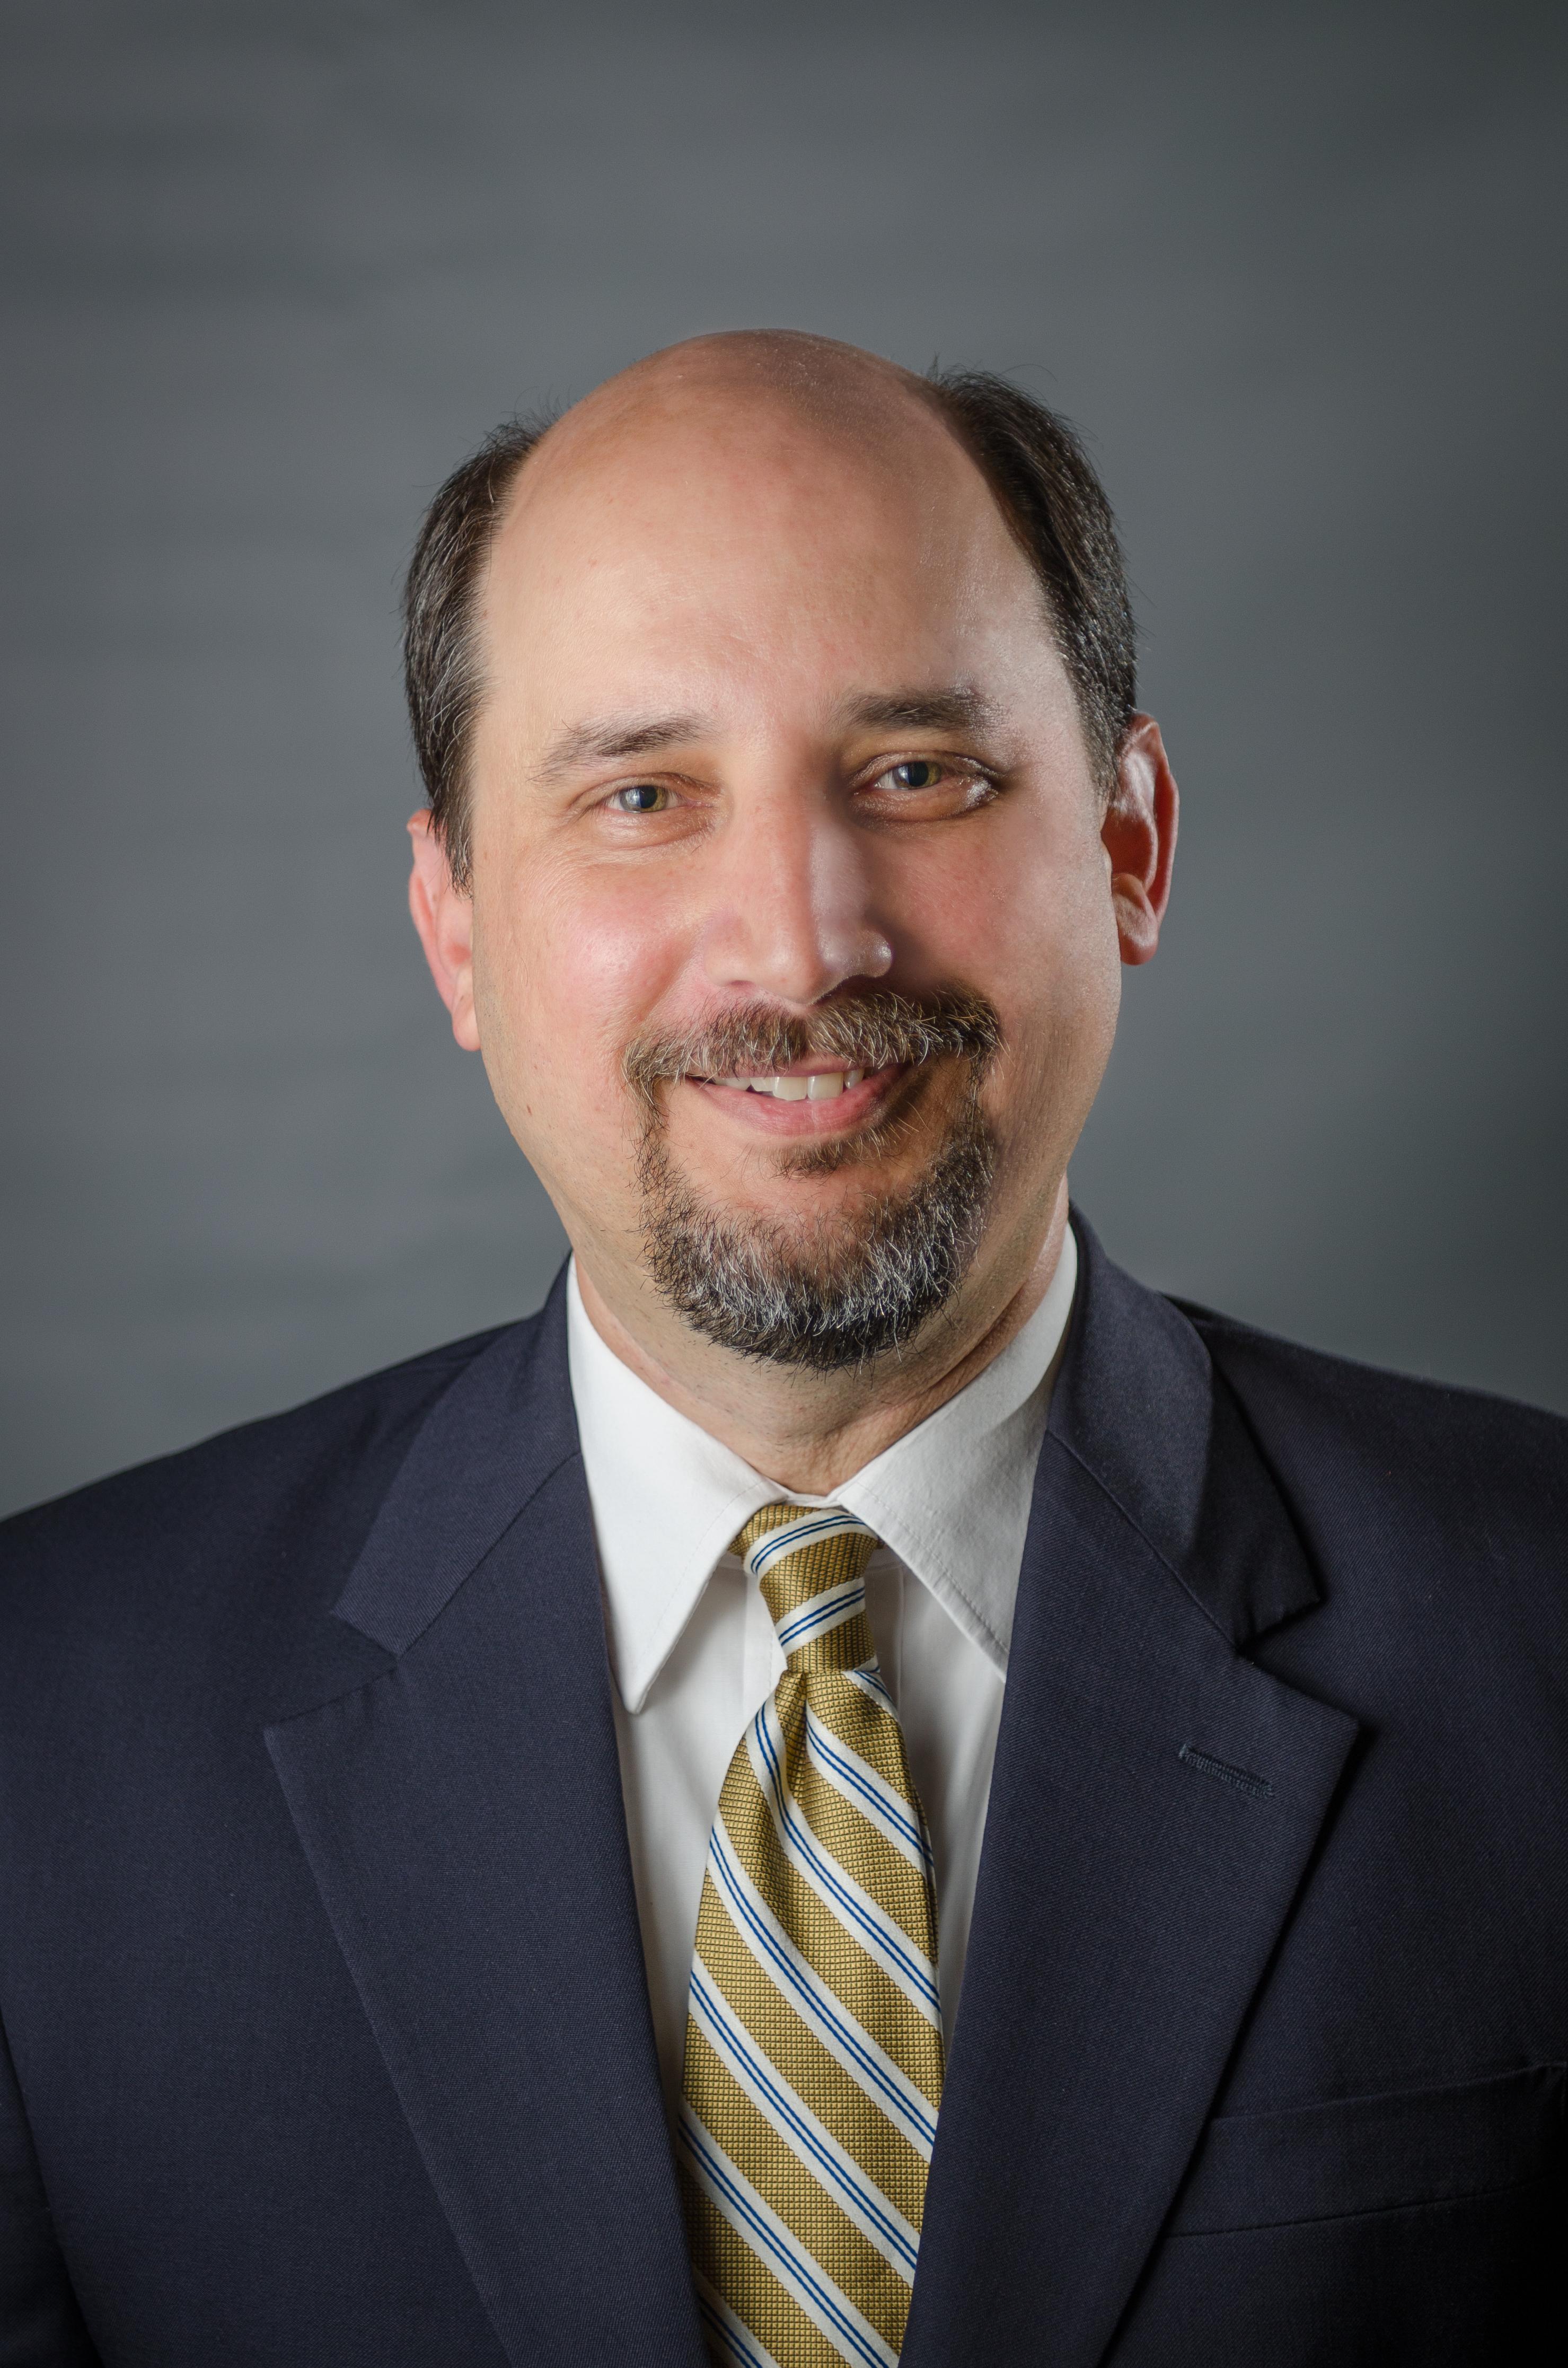 Vice Mayor Byington Headshot